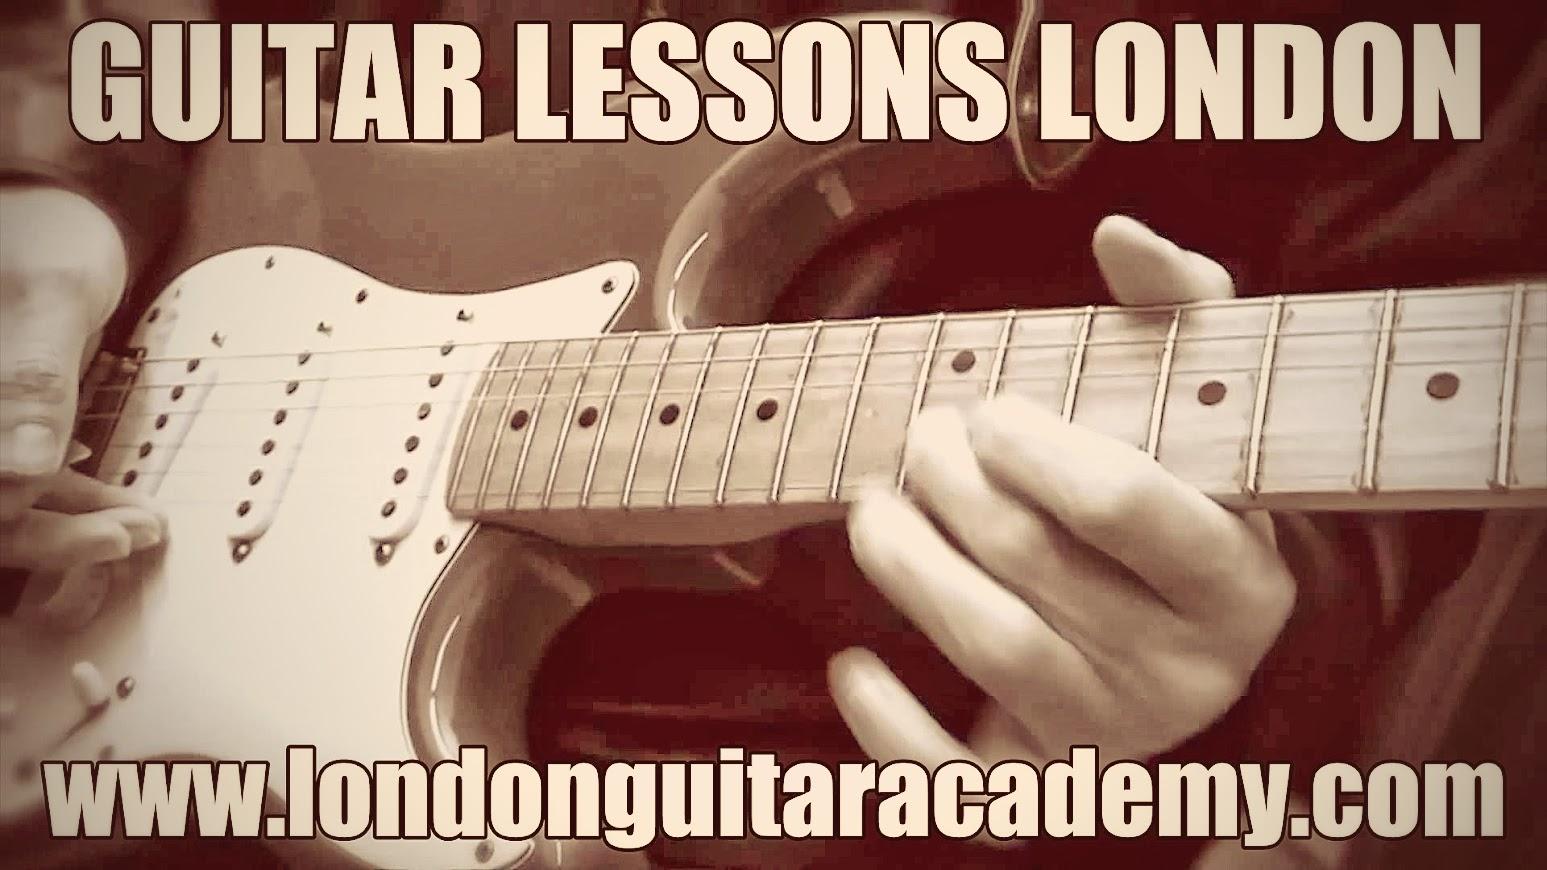 Guitar Teacher Central London